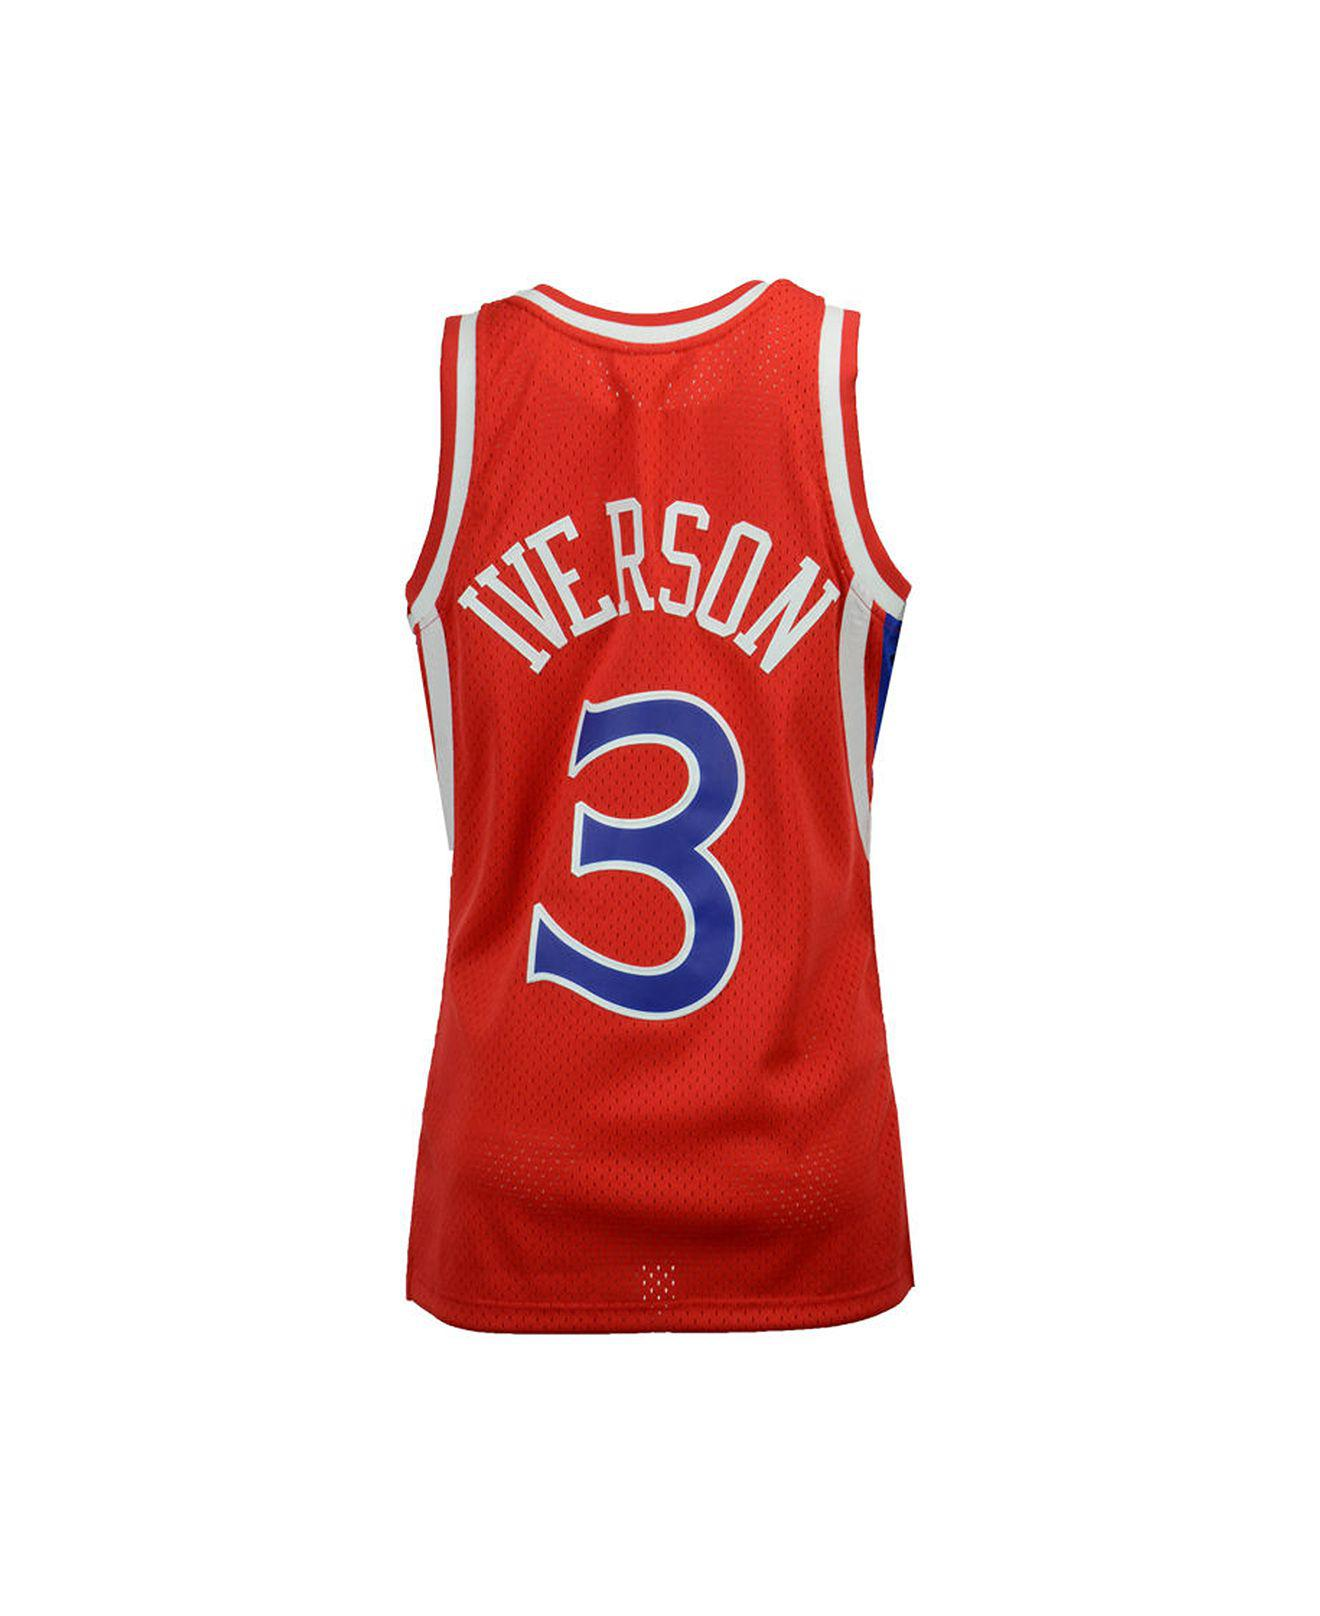 6e905c3bd ... mitchell ness. mens red allen iverson philadelphia 76ers hardwood  classic swingman jersey